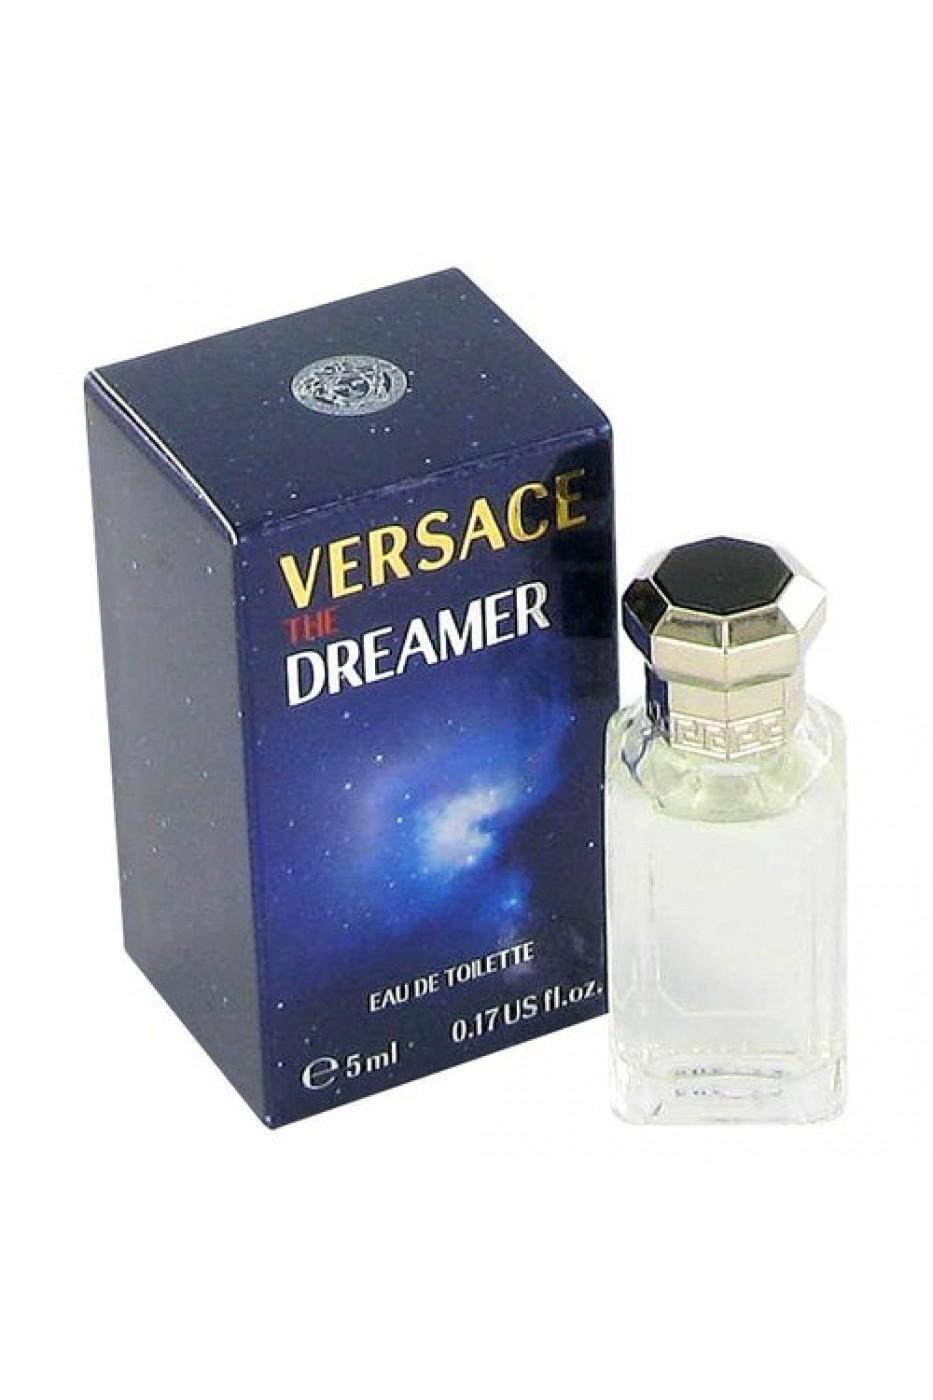 Versace Dreamer аромат для мужчин